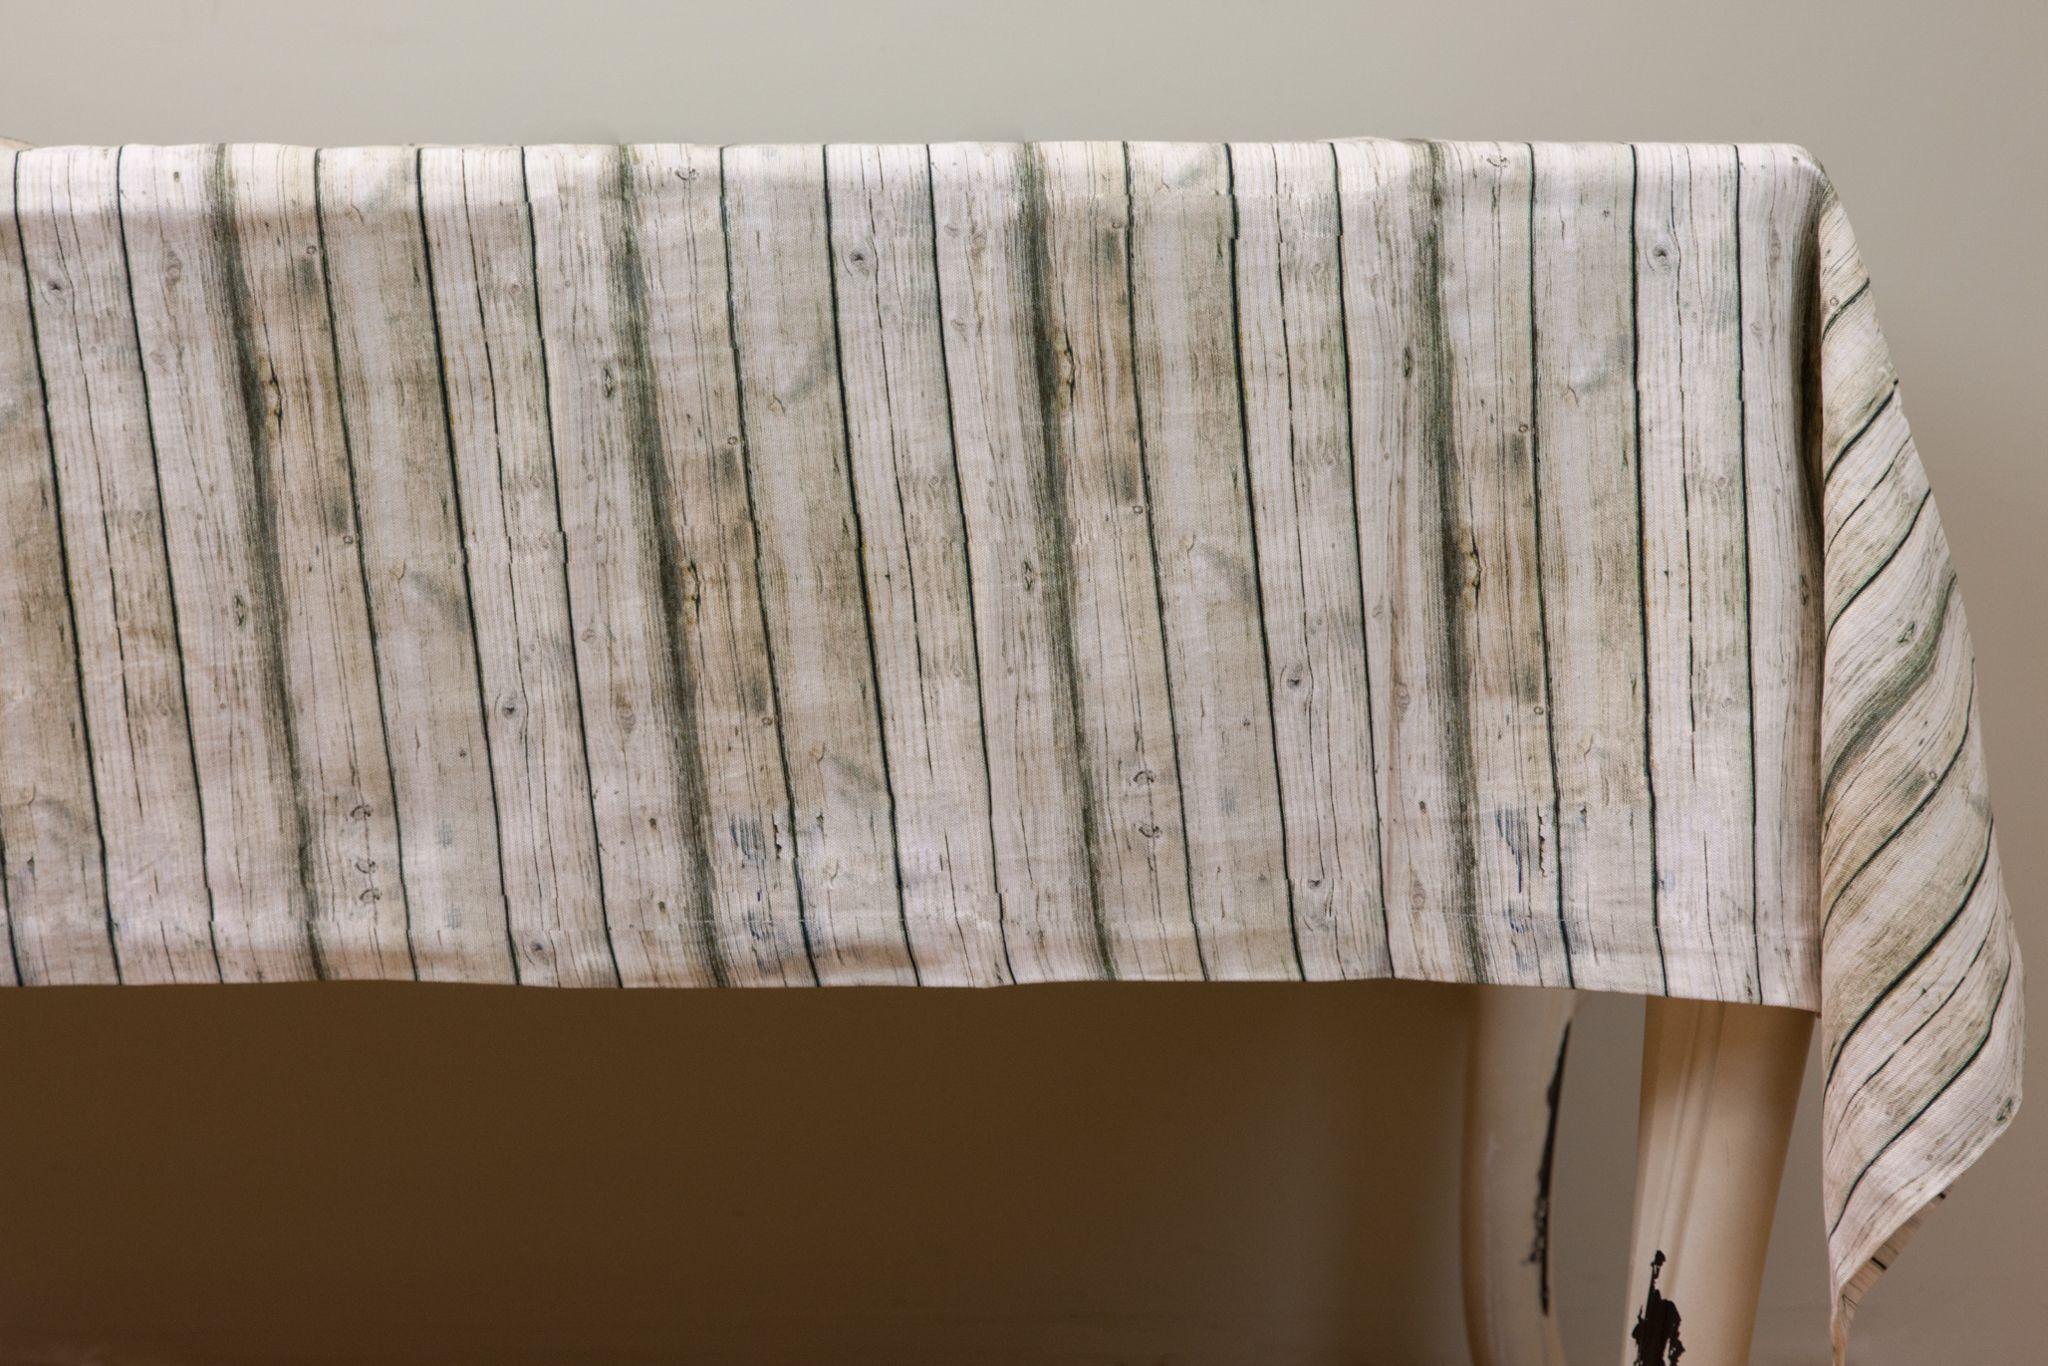 Toalha de Mesa Troncos 140 x 250 cm | A Loja do Gato Preto | #alojadogatopreto | #shoponline | referência 26865750